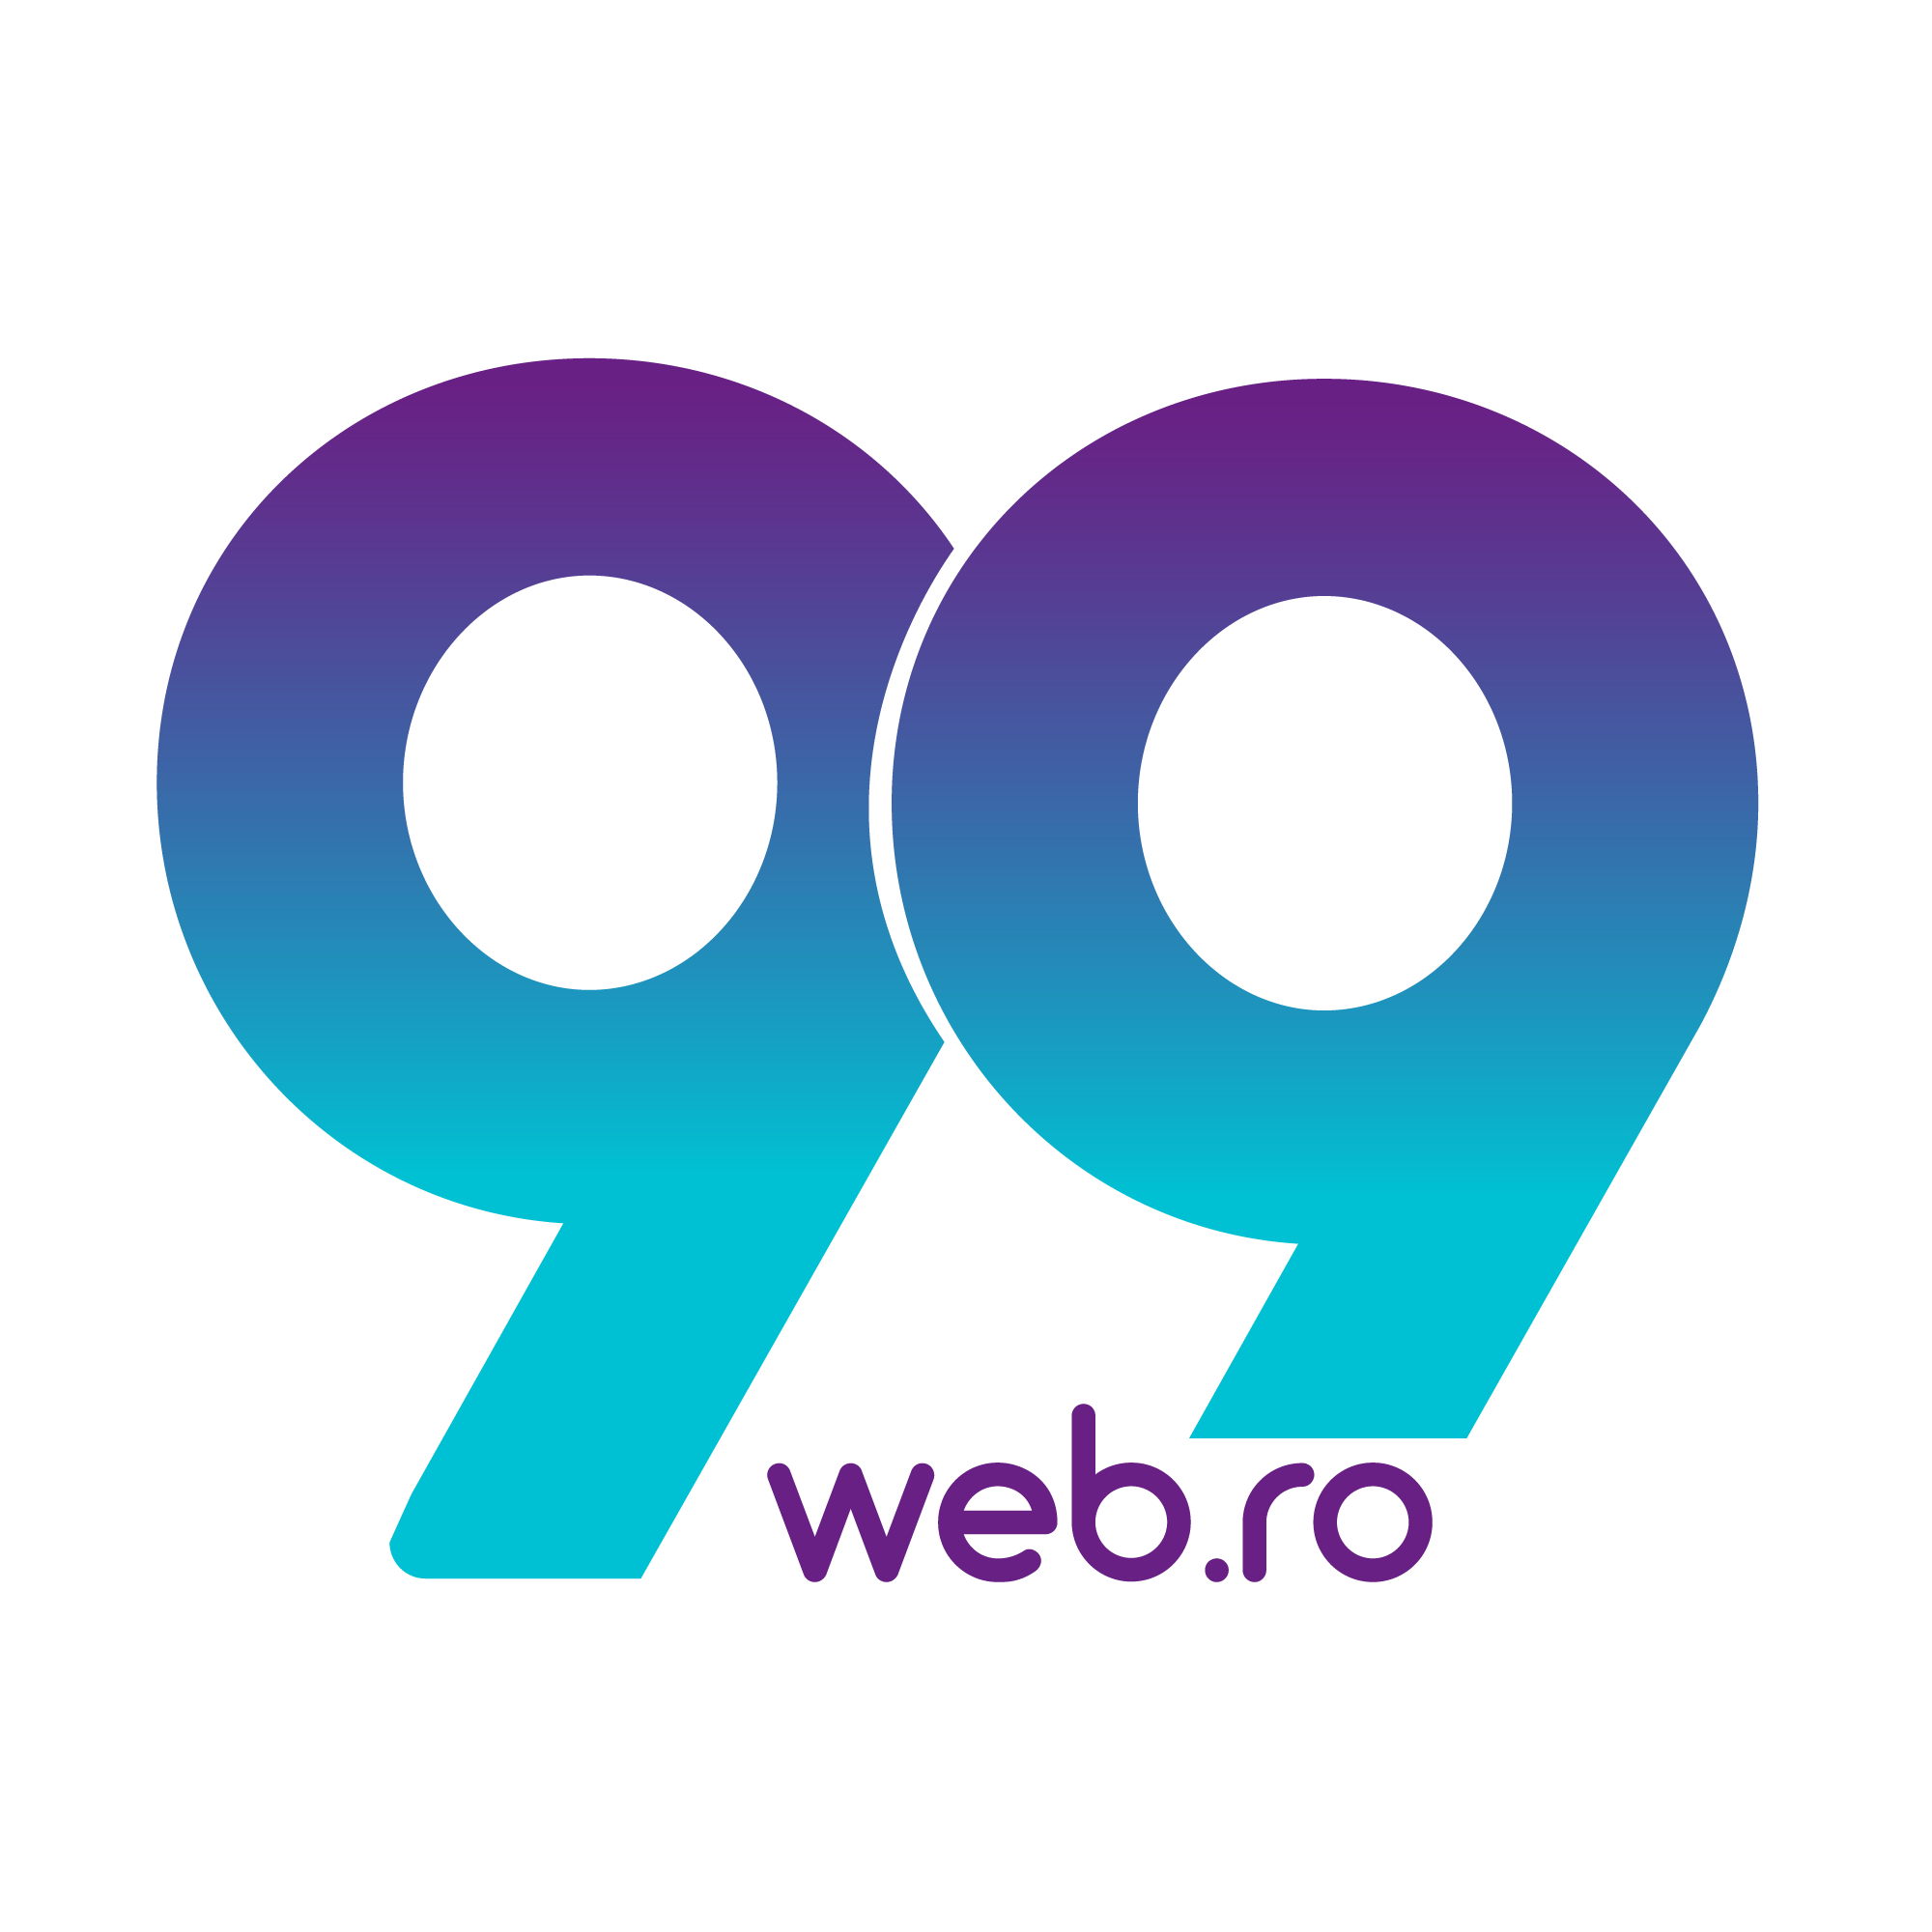 99web.ro